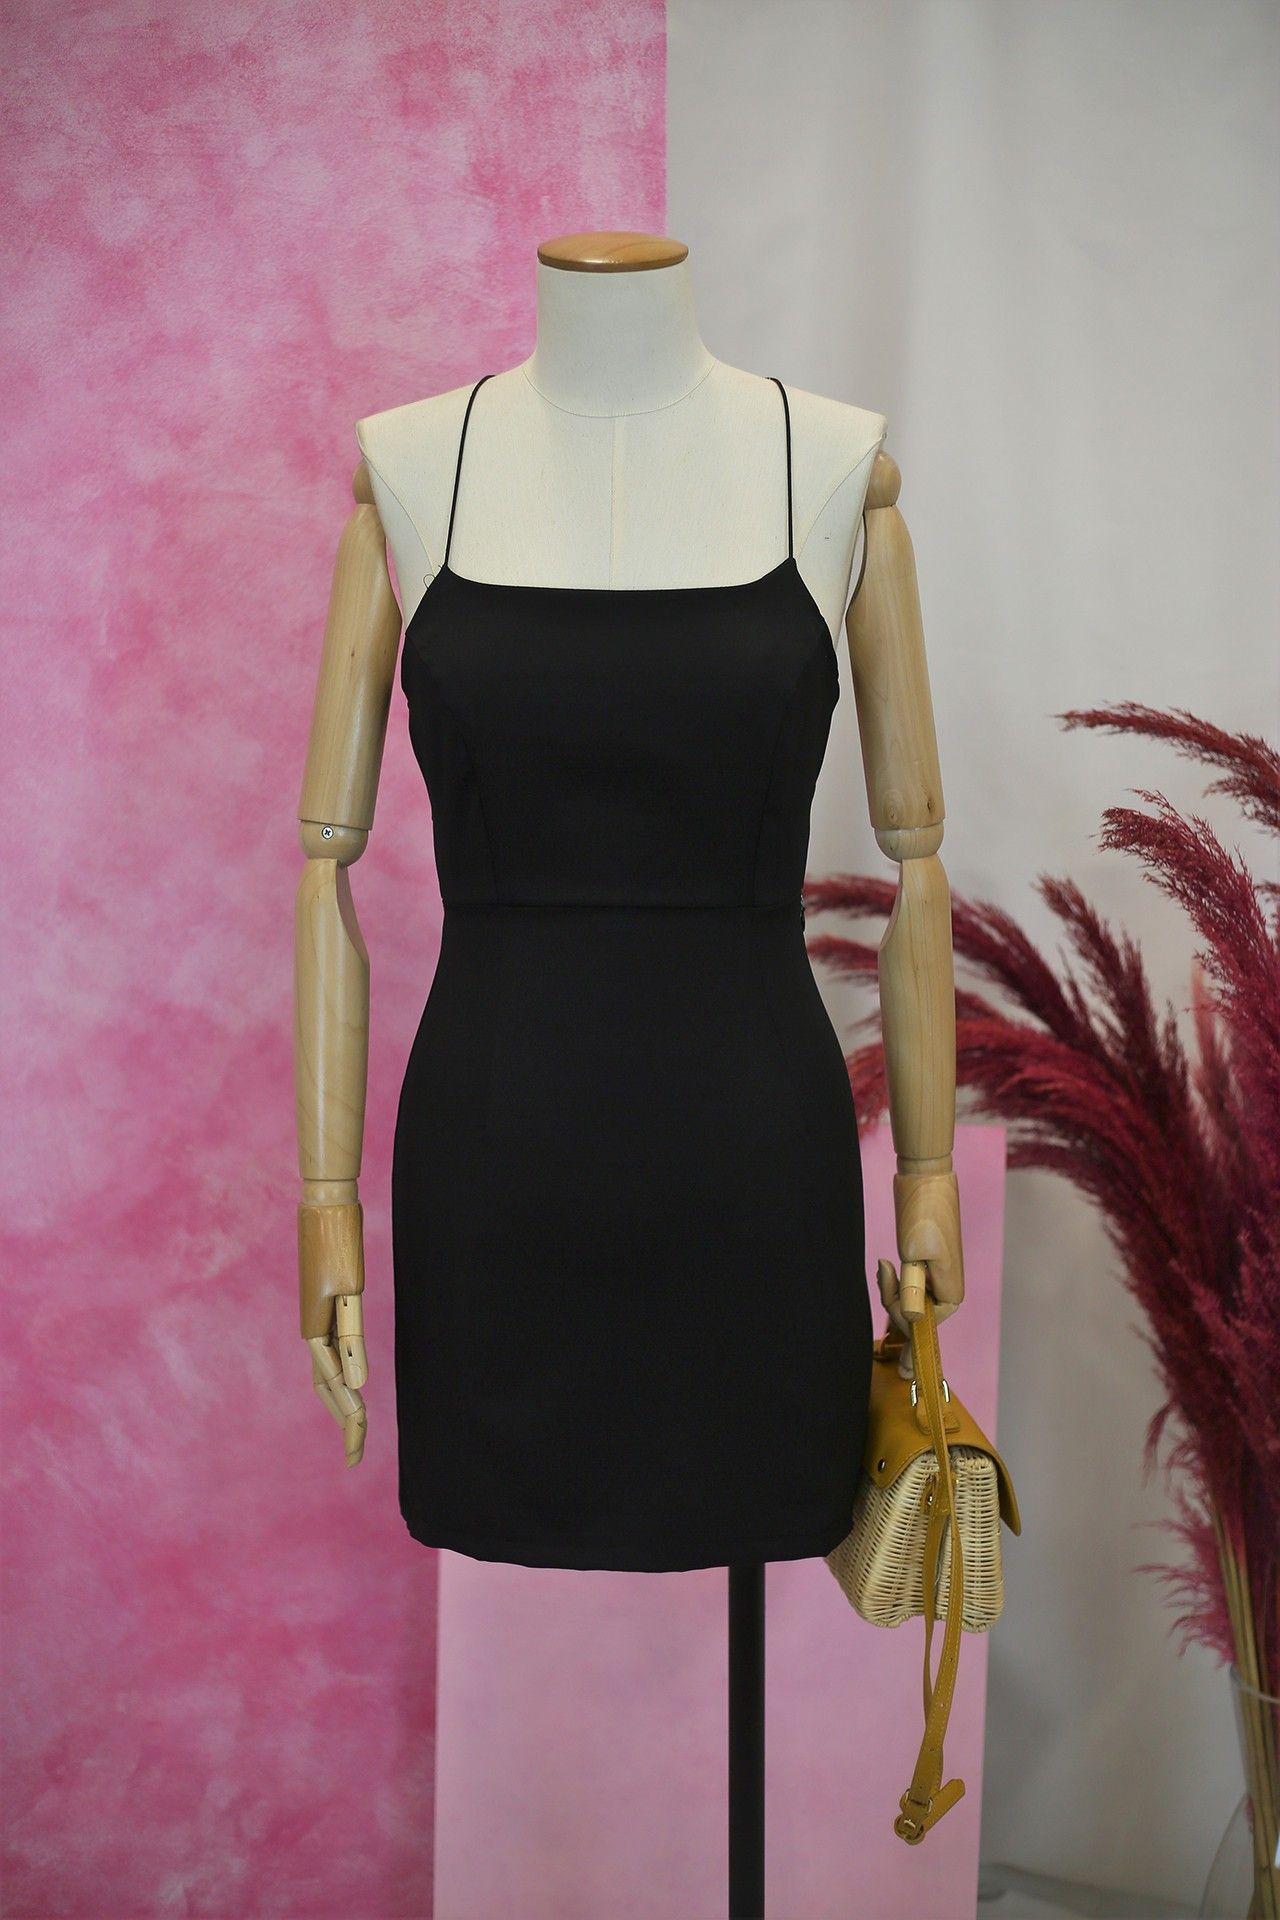 Ince Askili Siyah Mini Elbise 99 9 Ince Askili Siyah Mini Elbise Mini Elbise Elbise Ust Giyim